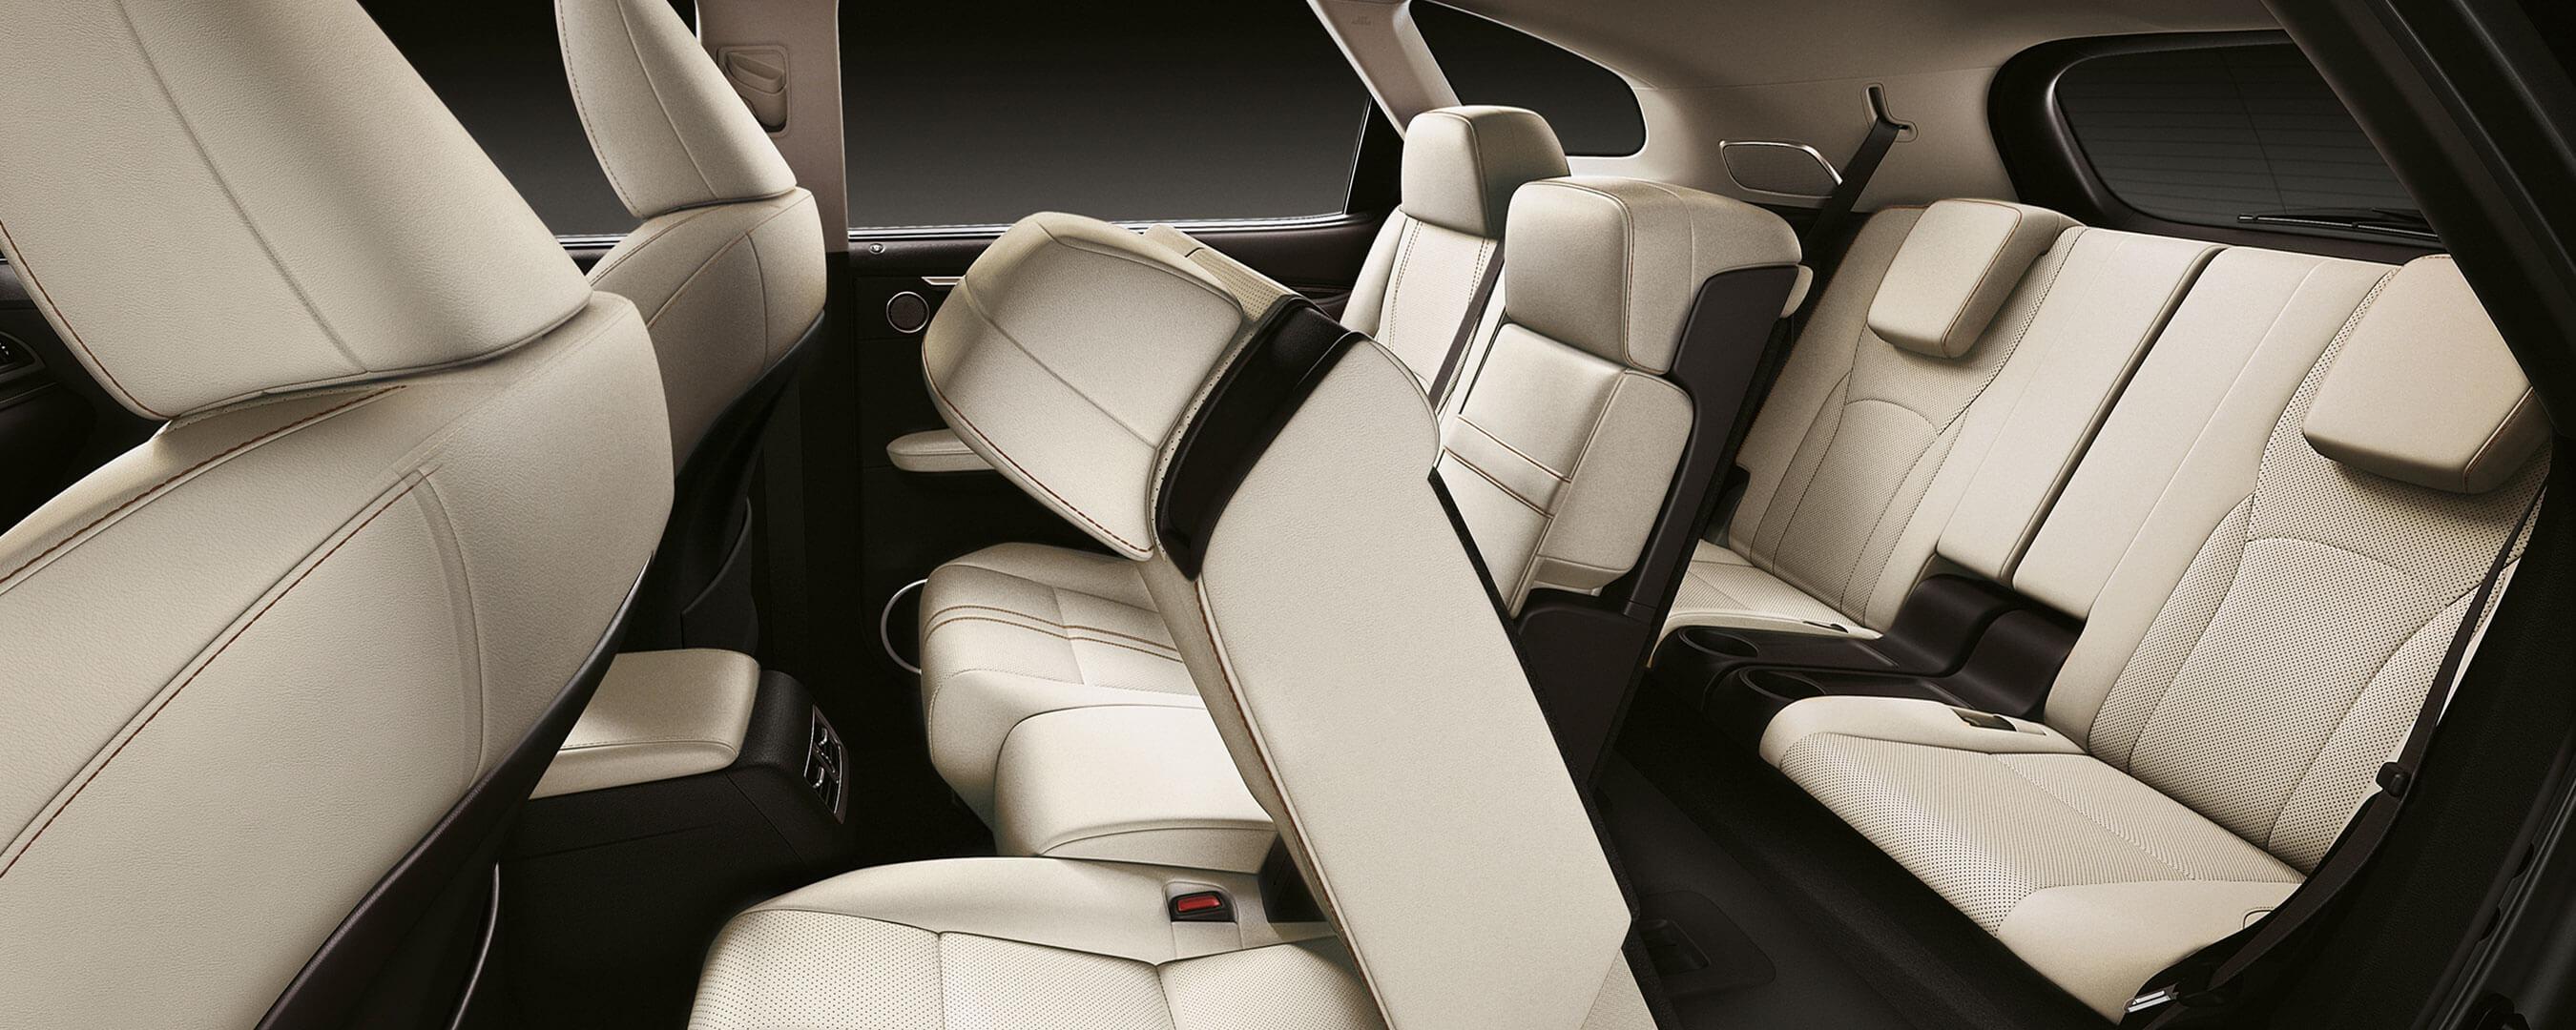 2021 lexus rx l experience hero interior rear